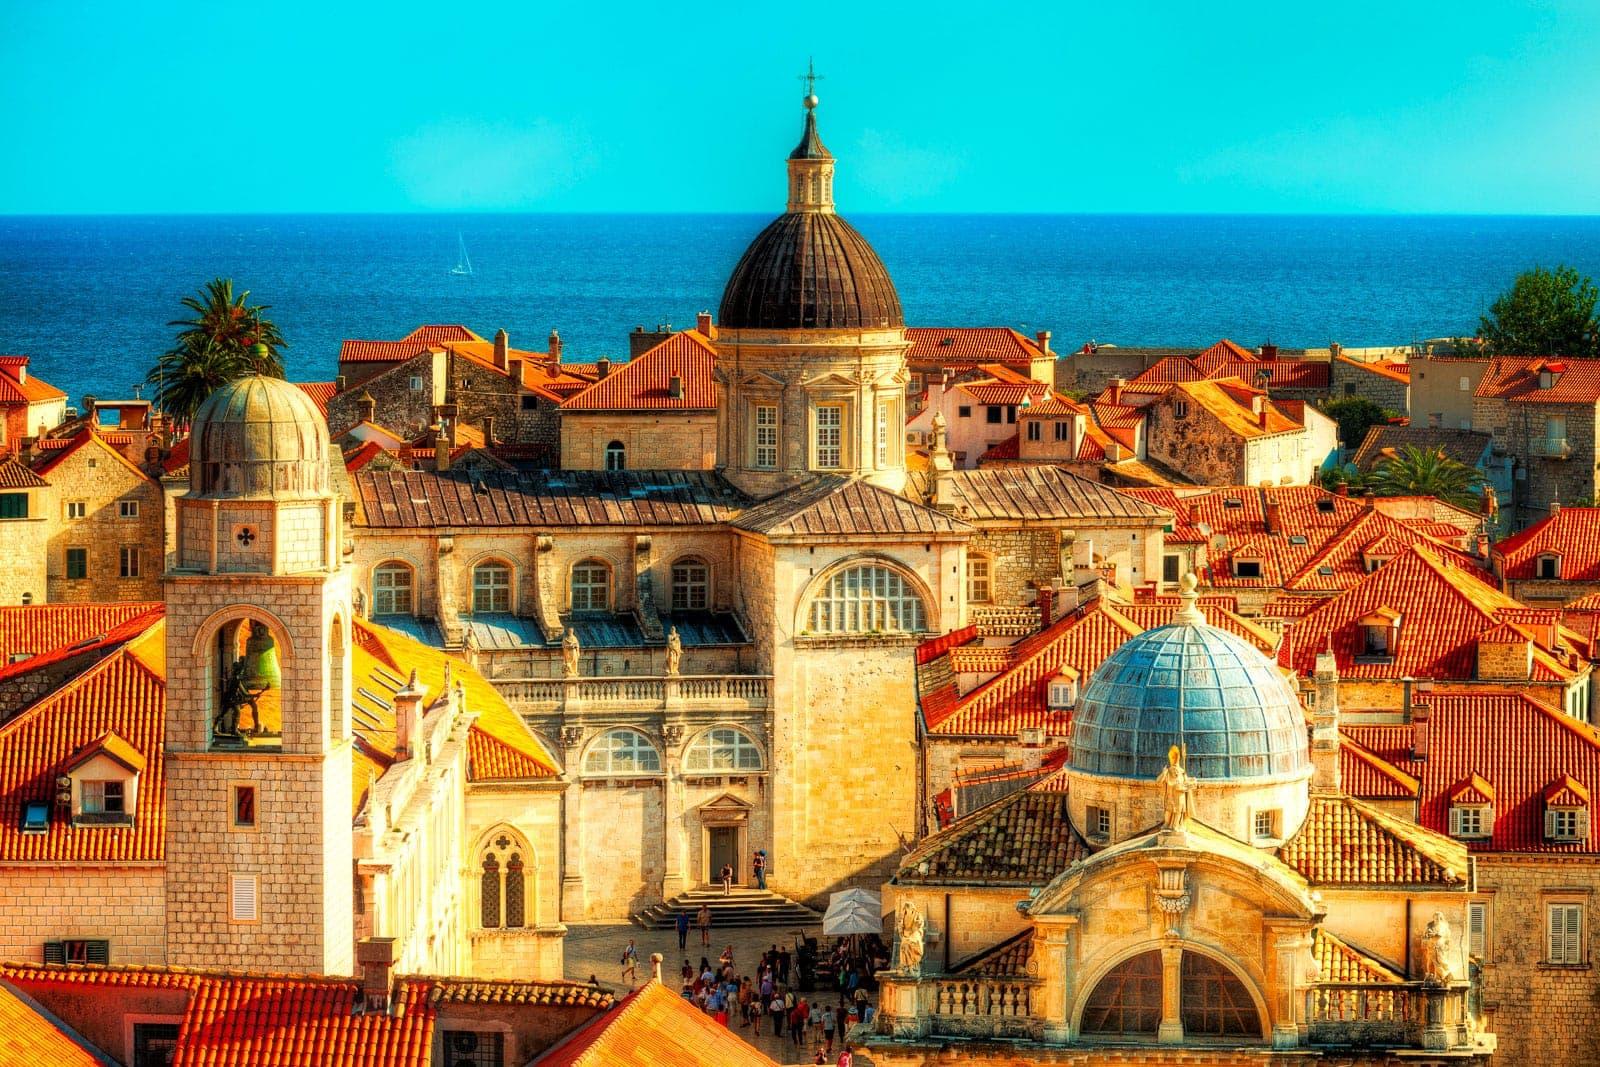 Dubrovnik's towers | Dubrovnik, Croatia